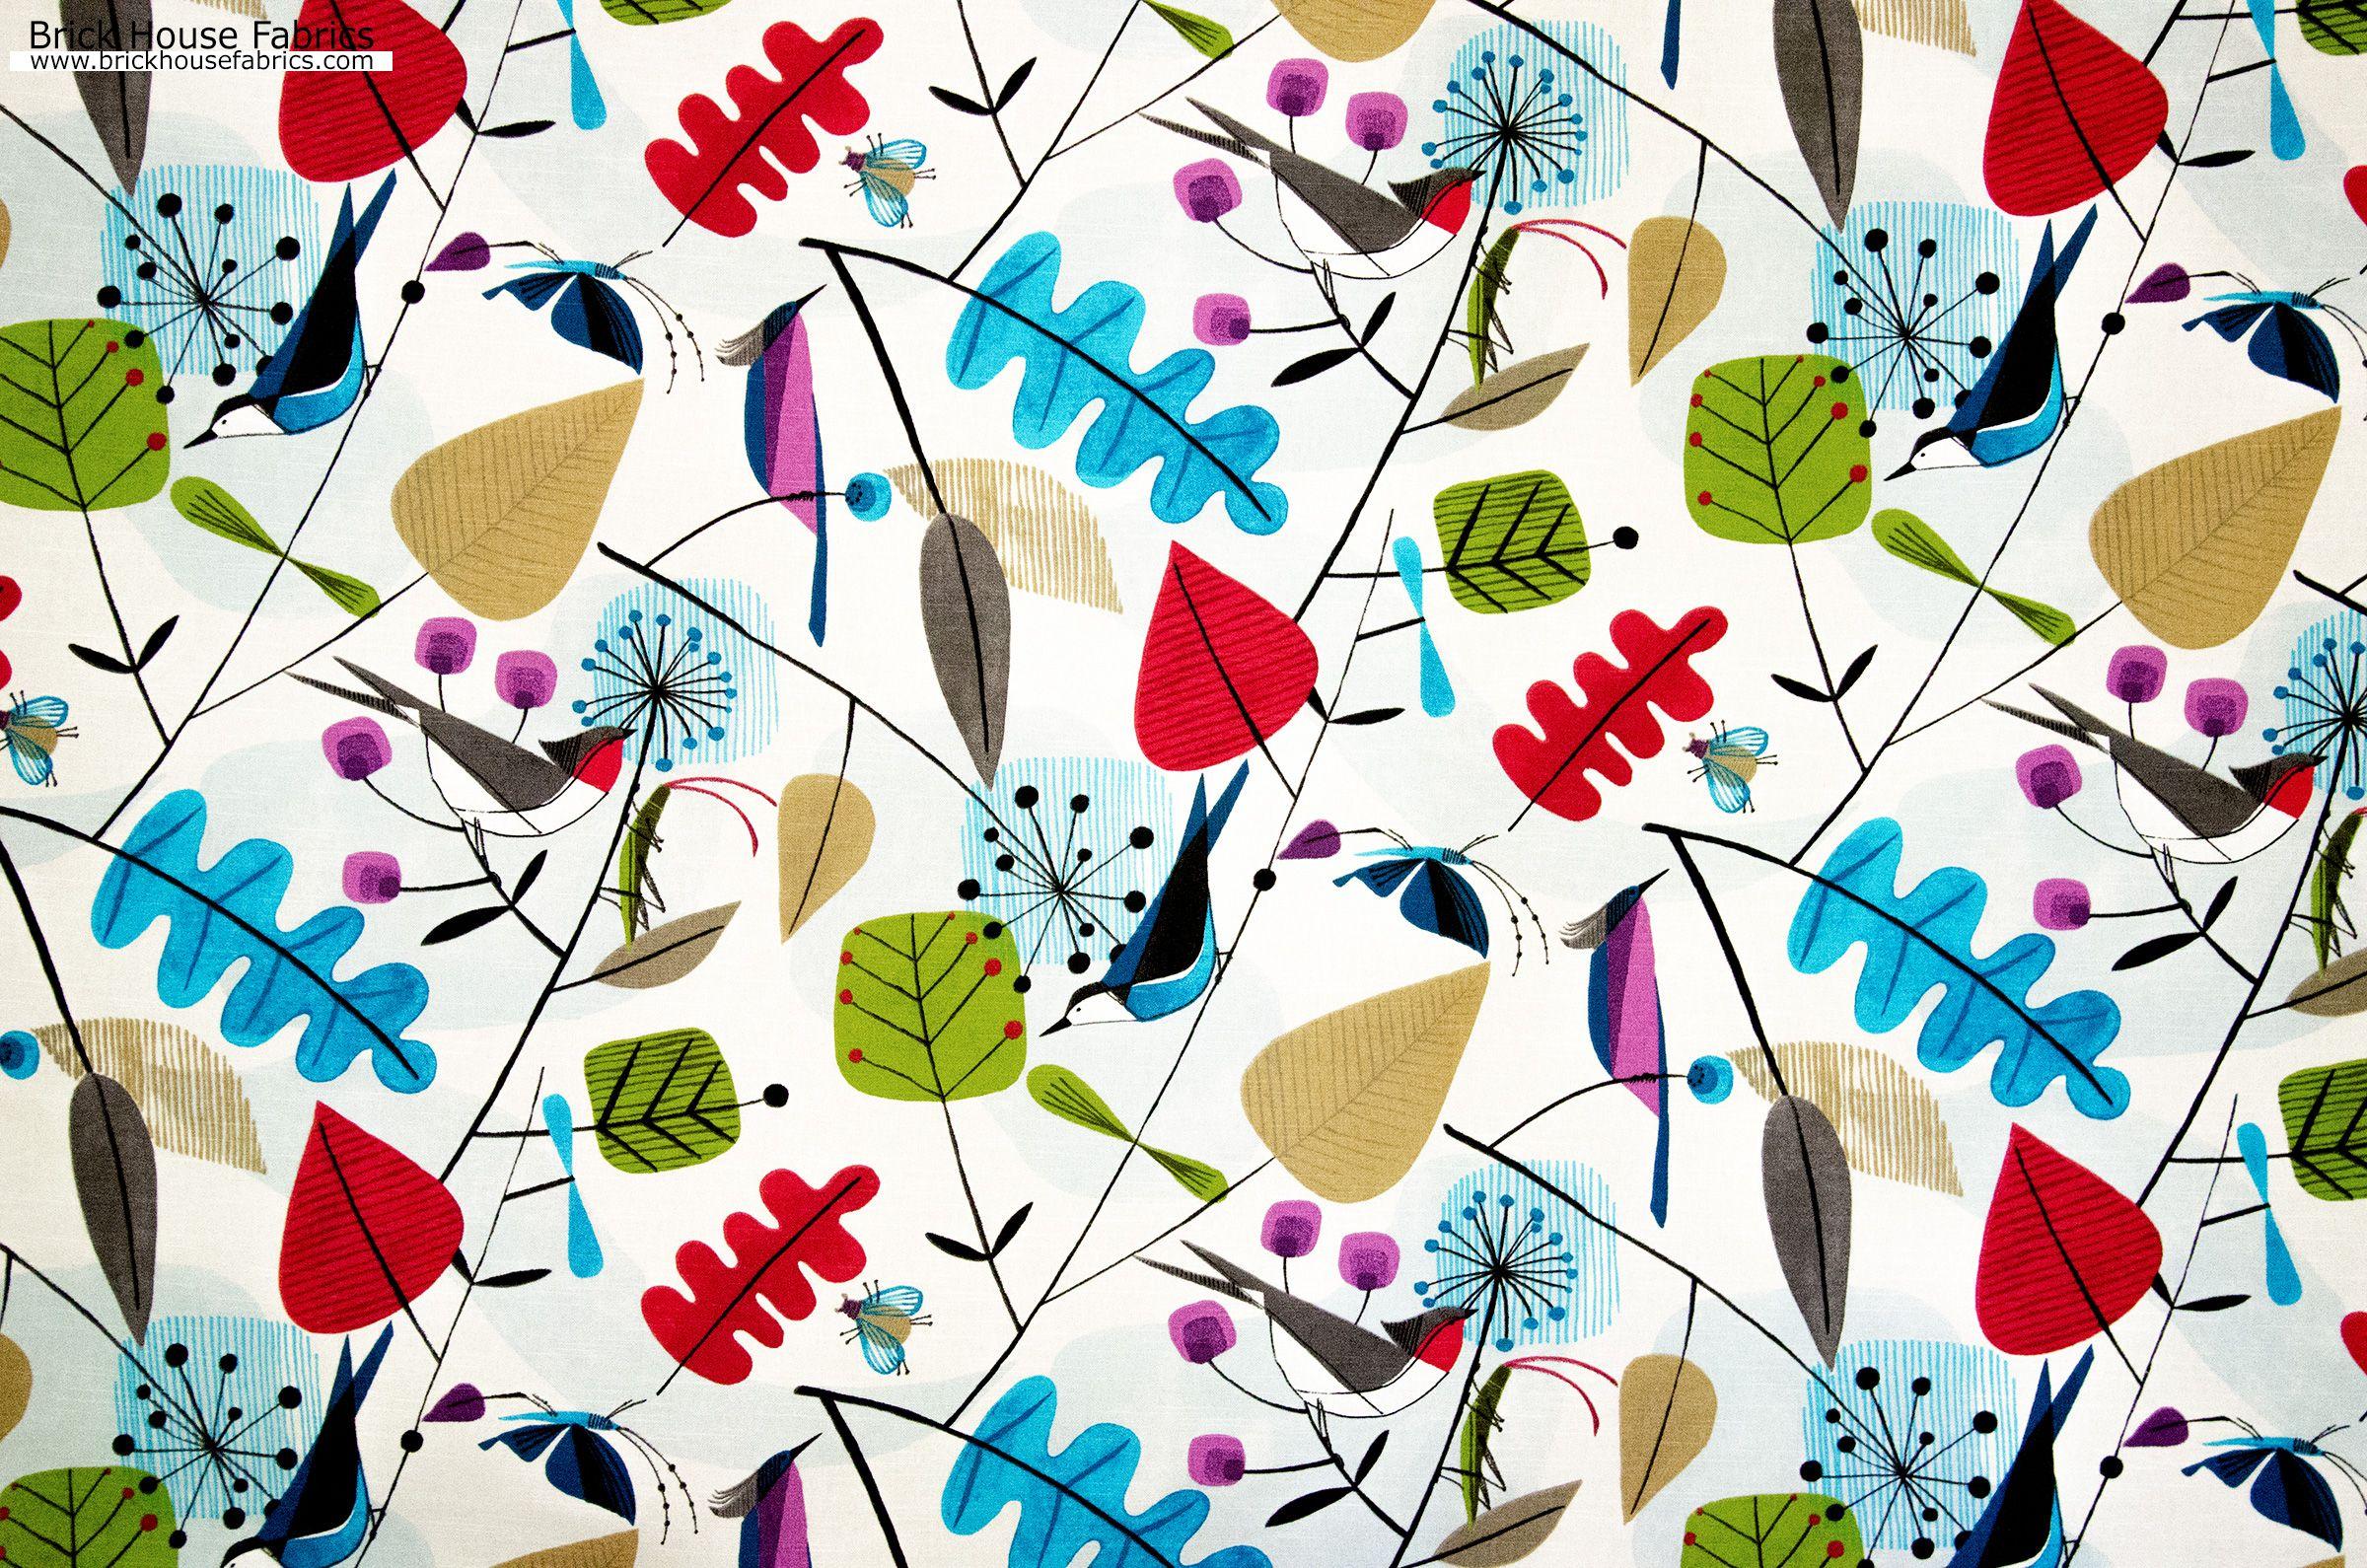 Scandinavian Fabric Retro Modern Graphic Bird Leaves Scandinavian Fabric Fabric Birds Fabric Wallpaper